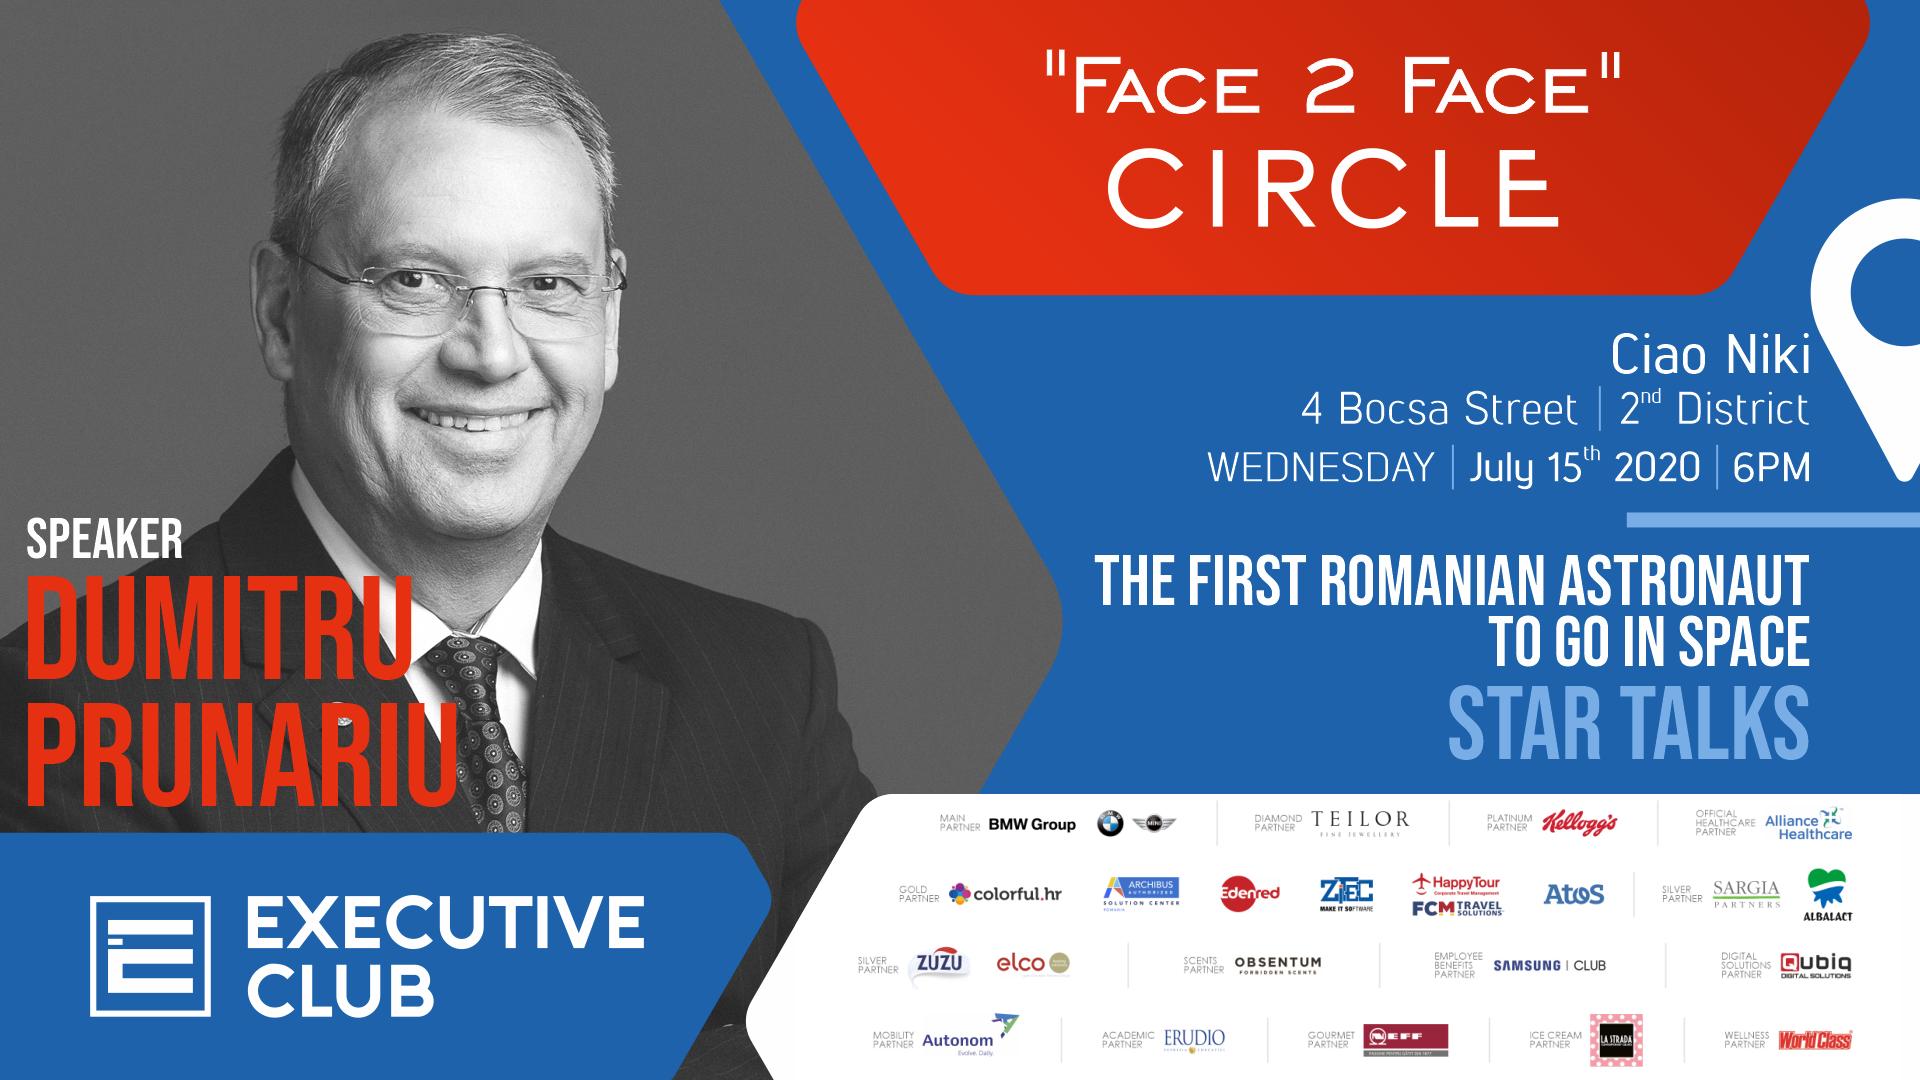 """Face 2 Face"" Executive Club Circle - Star Talks"